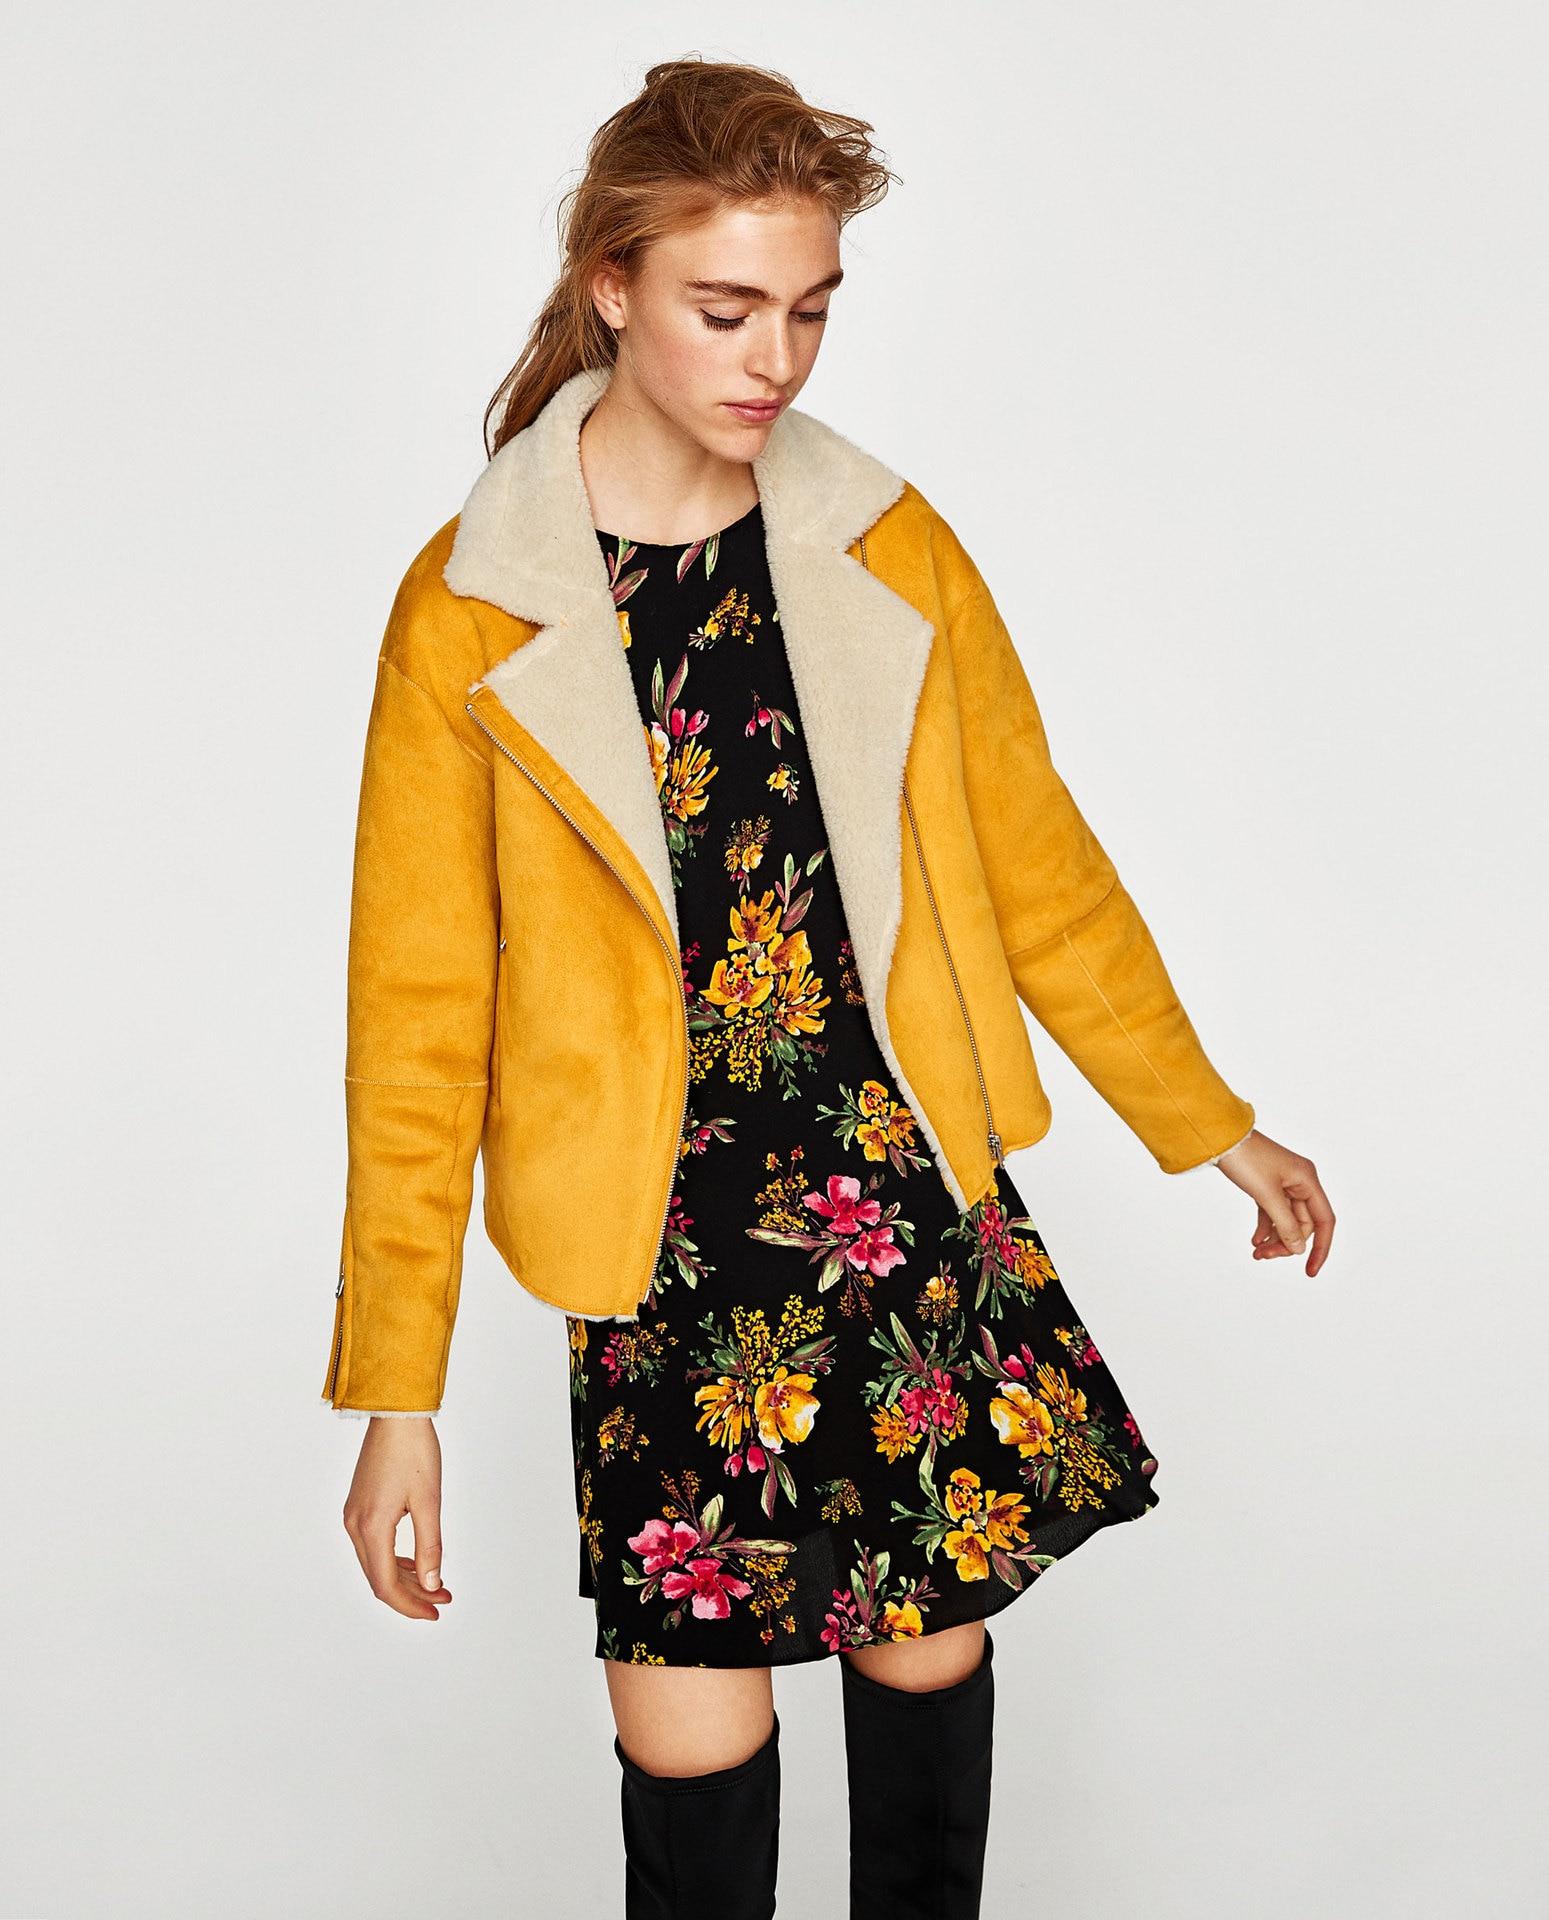 2018 women fashion winter   basic     jackets   faux suede short   jacket   lambswool collar warm thick coats slim zipper pockets outerwear